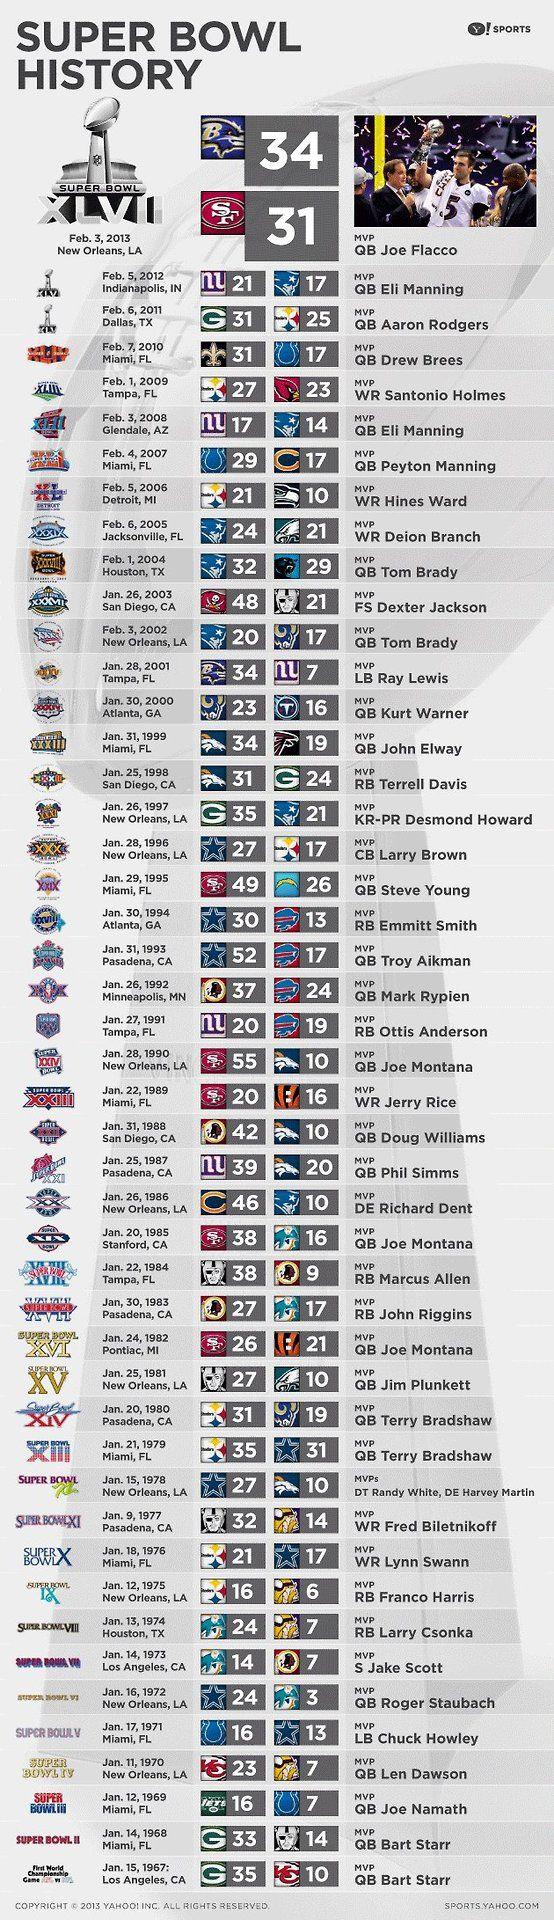 Super Bowl I to Super Bowl XLVII